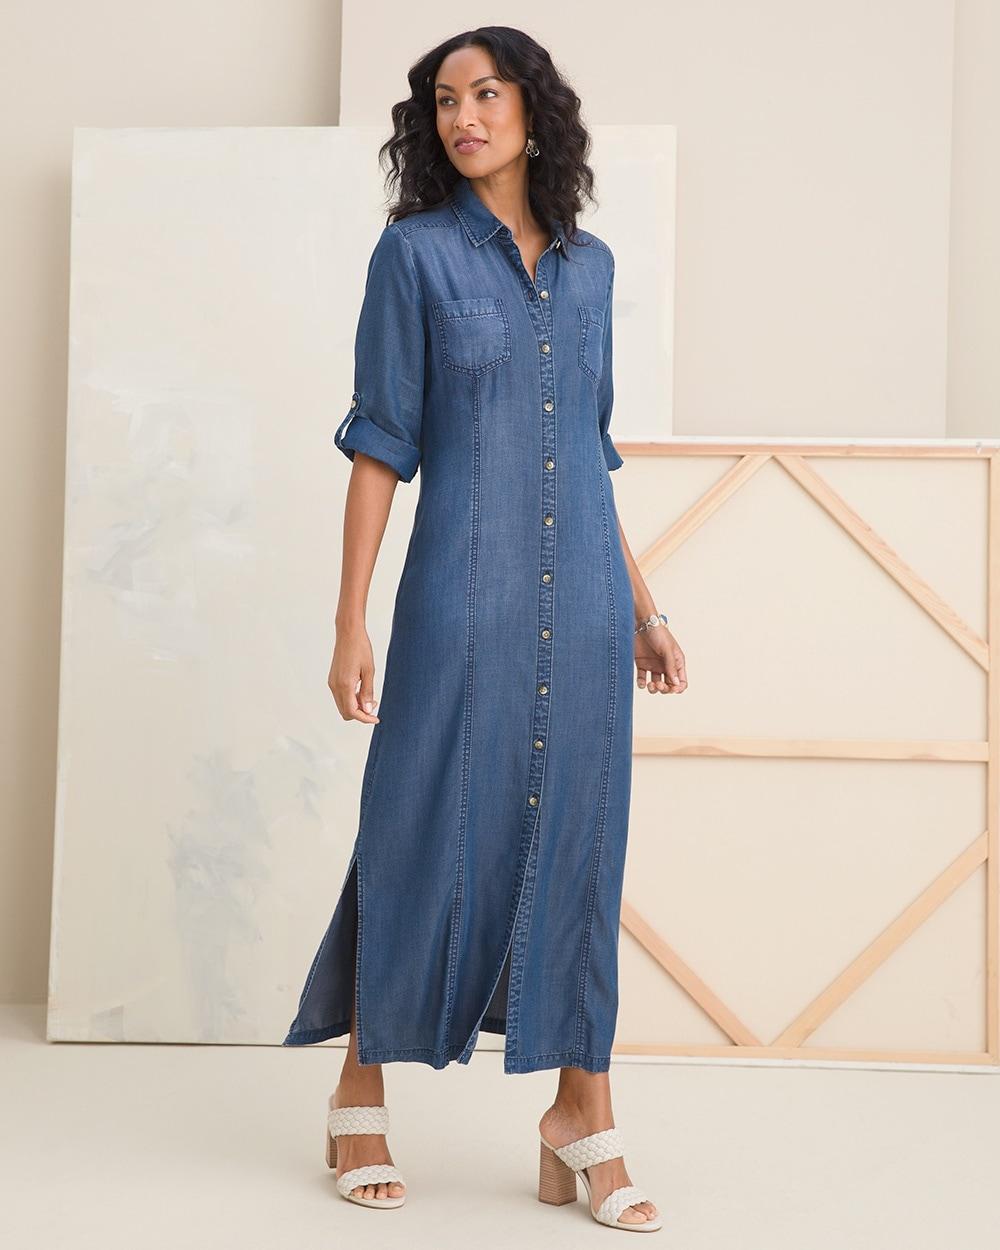 Jean Maxi Dress,denim maxi dress,denim maxi dress,denim maxi dress,